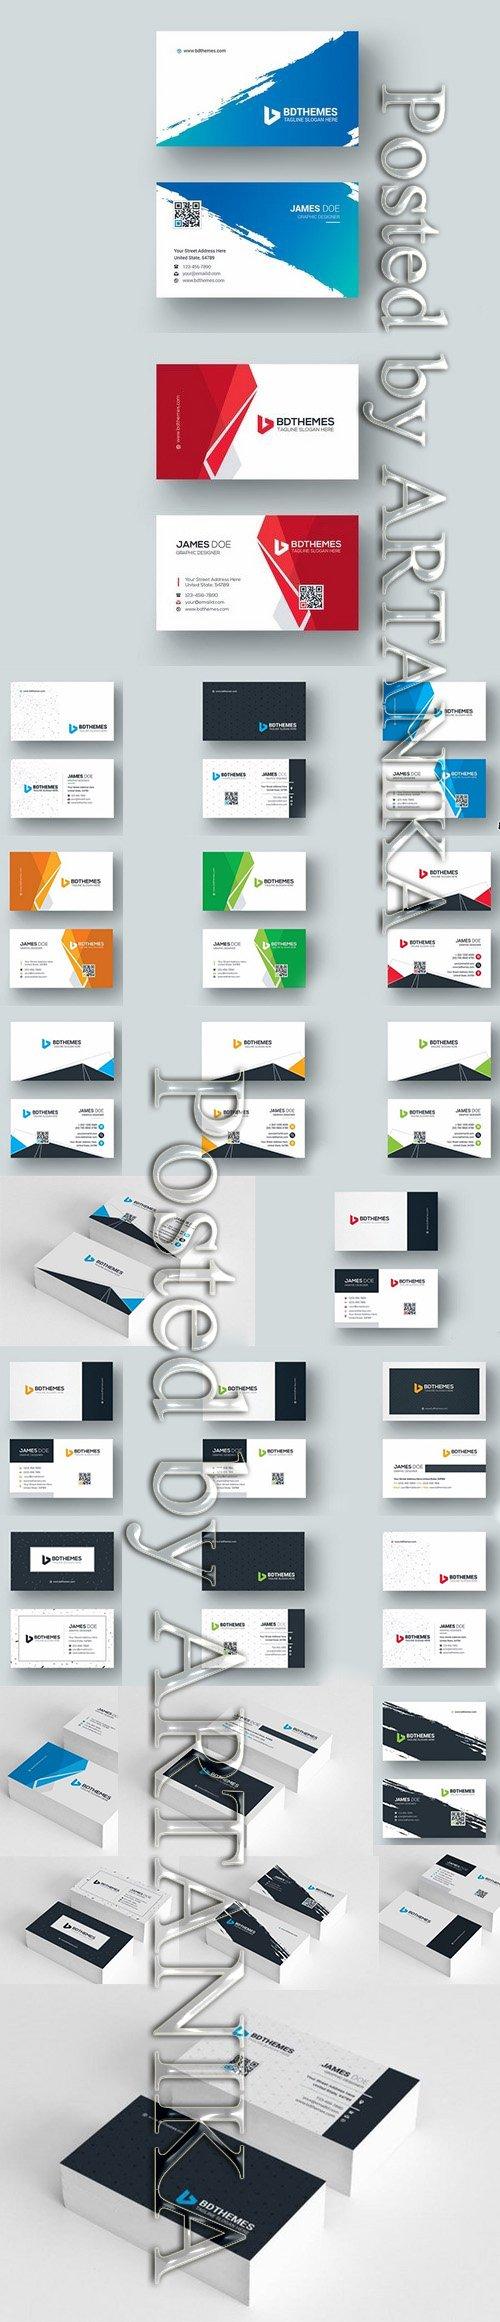 Business Card Big Bundle 2019